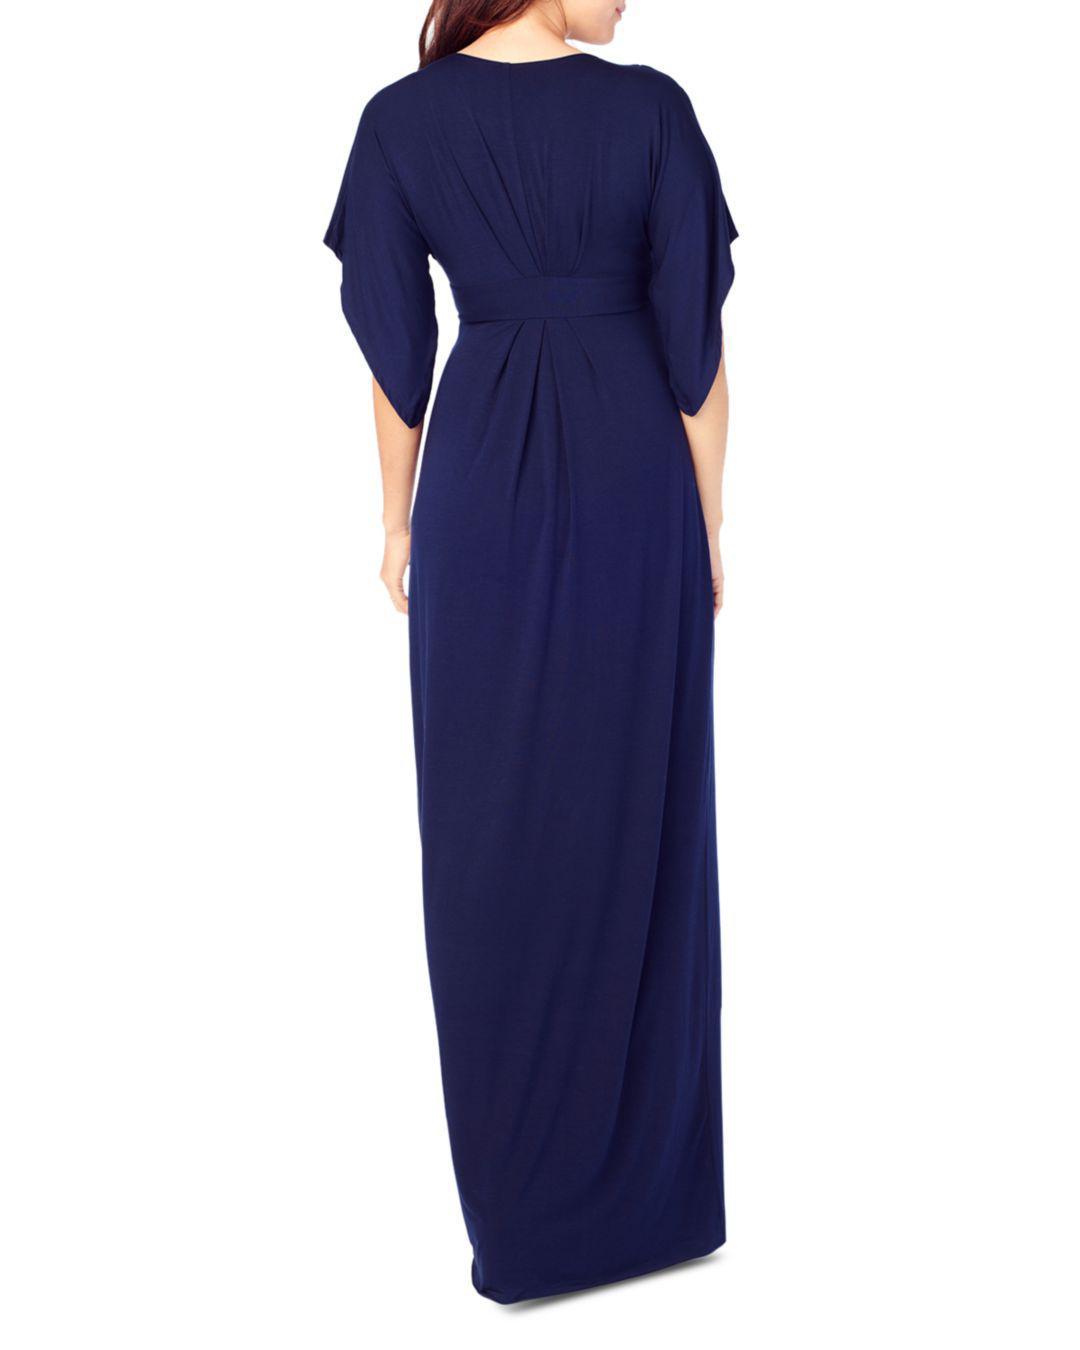 a66f44a0161d8 Ingrid & Isabel Split Kimono Sleeve Maternity Maxi Dress in Blue - Lyst